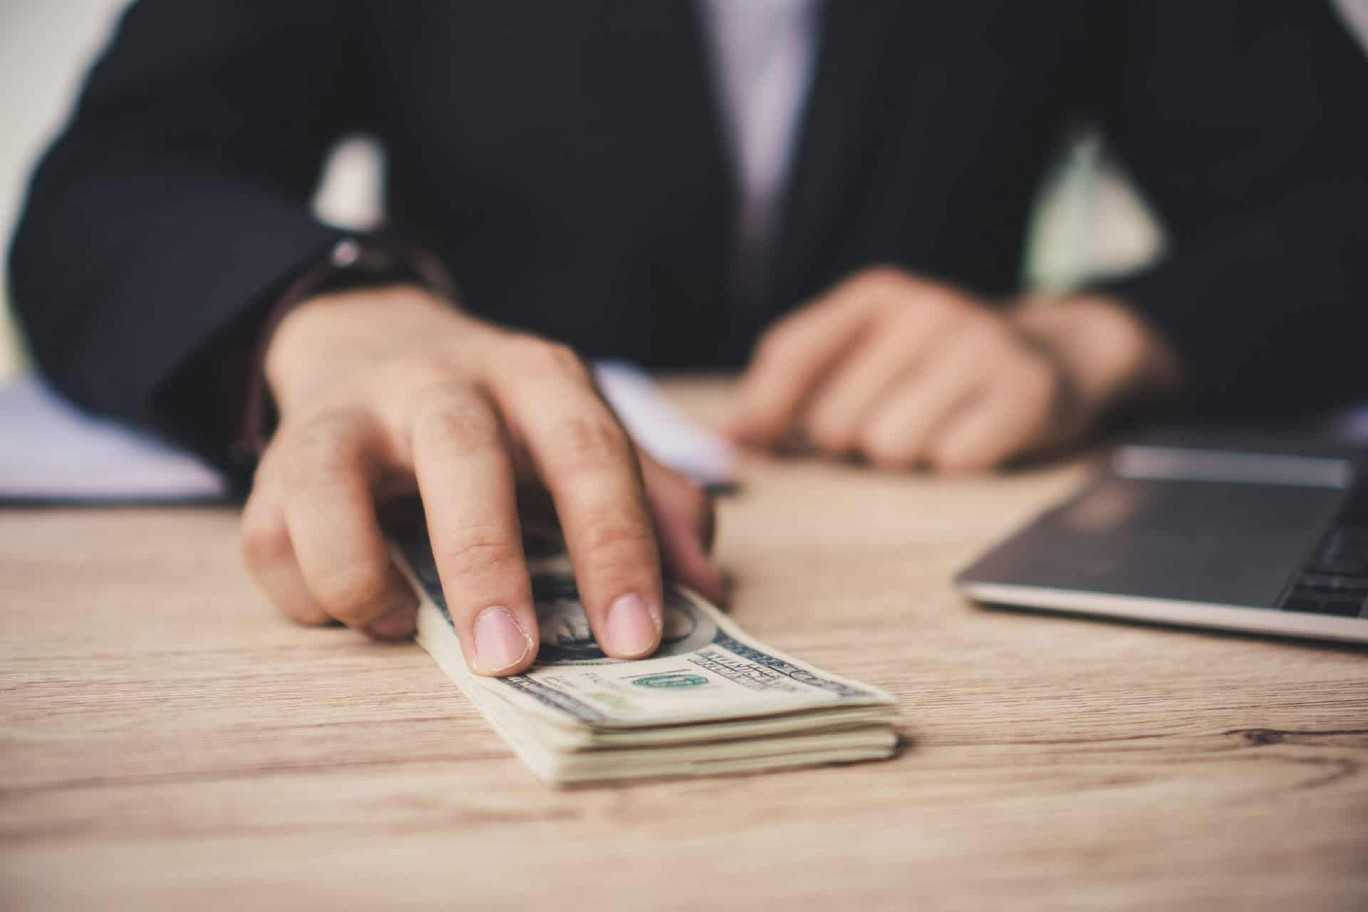 Business Man Hand Close Up Preparing Tax Filing